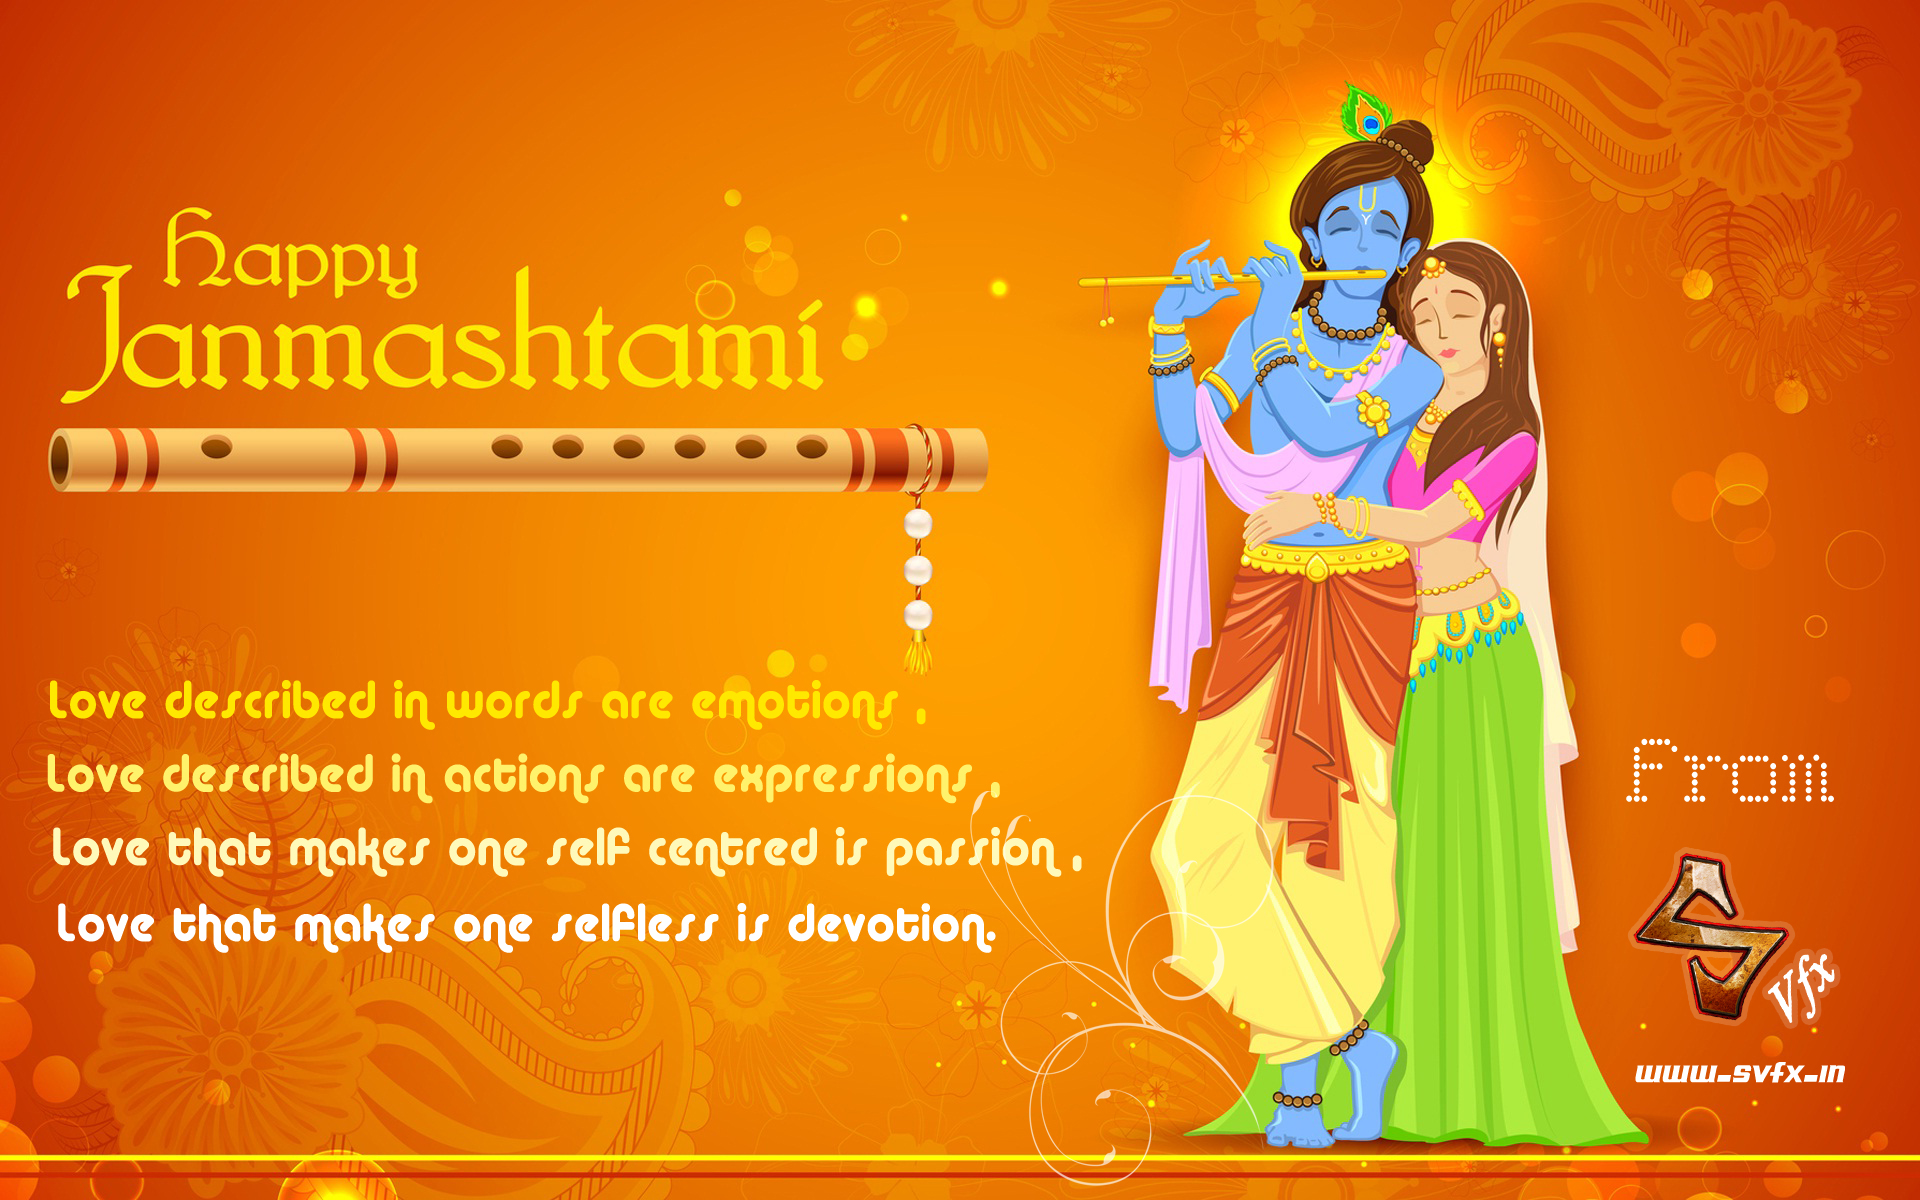 Happy Janmashtami to all from SVFX Animation Studio Pune